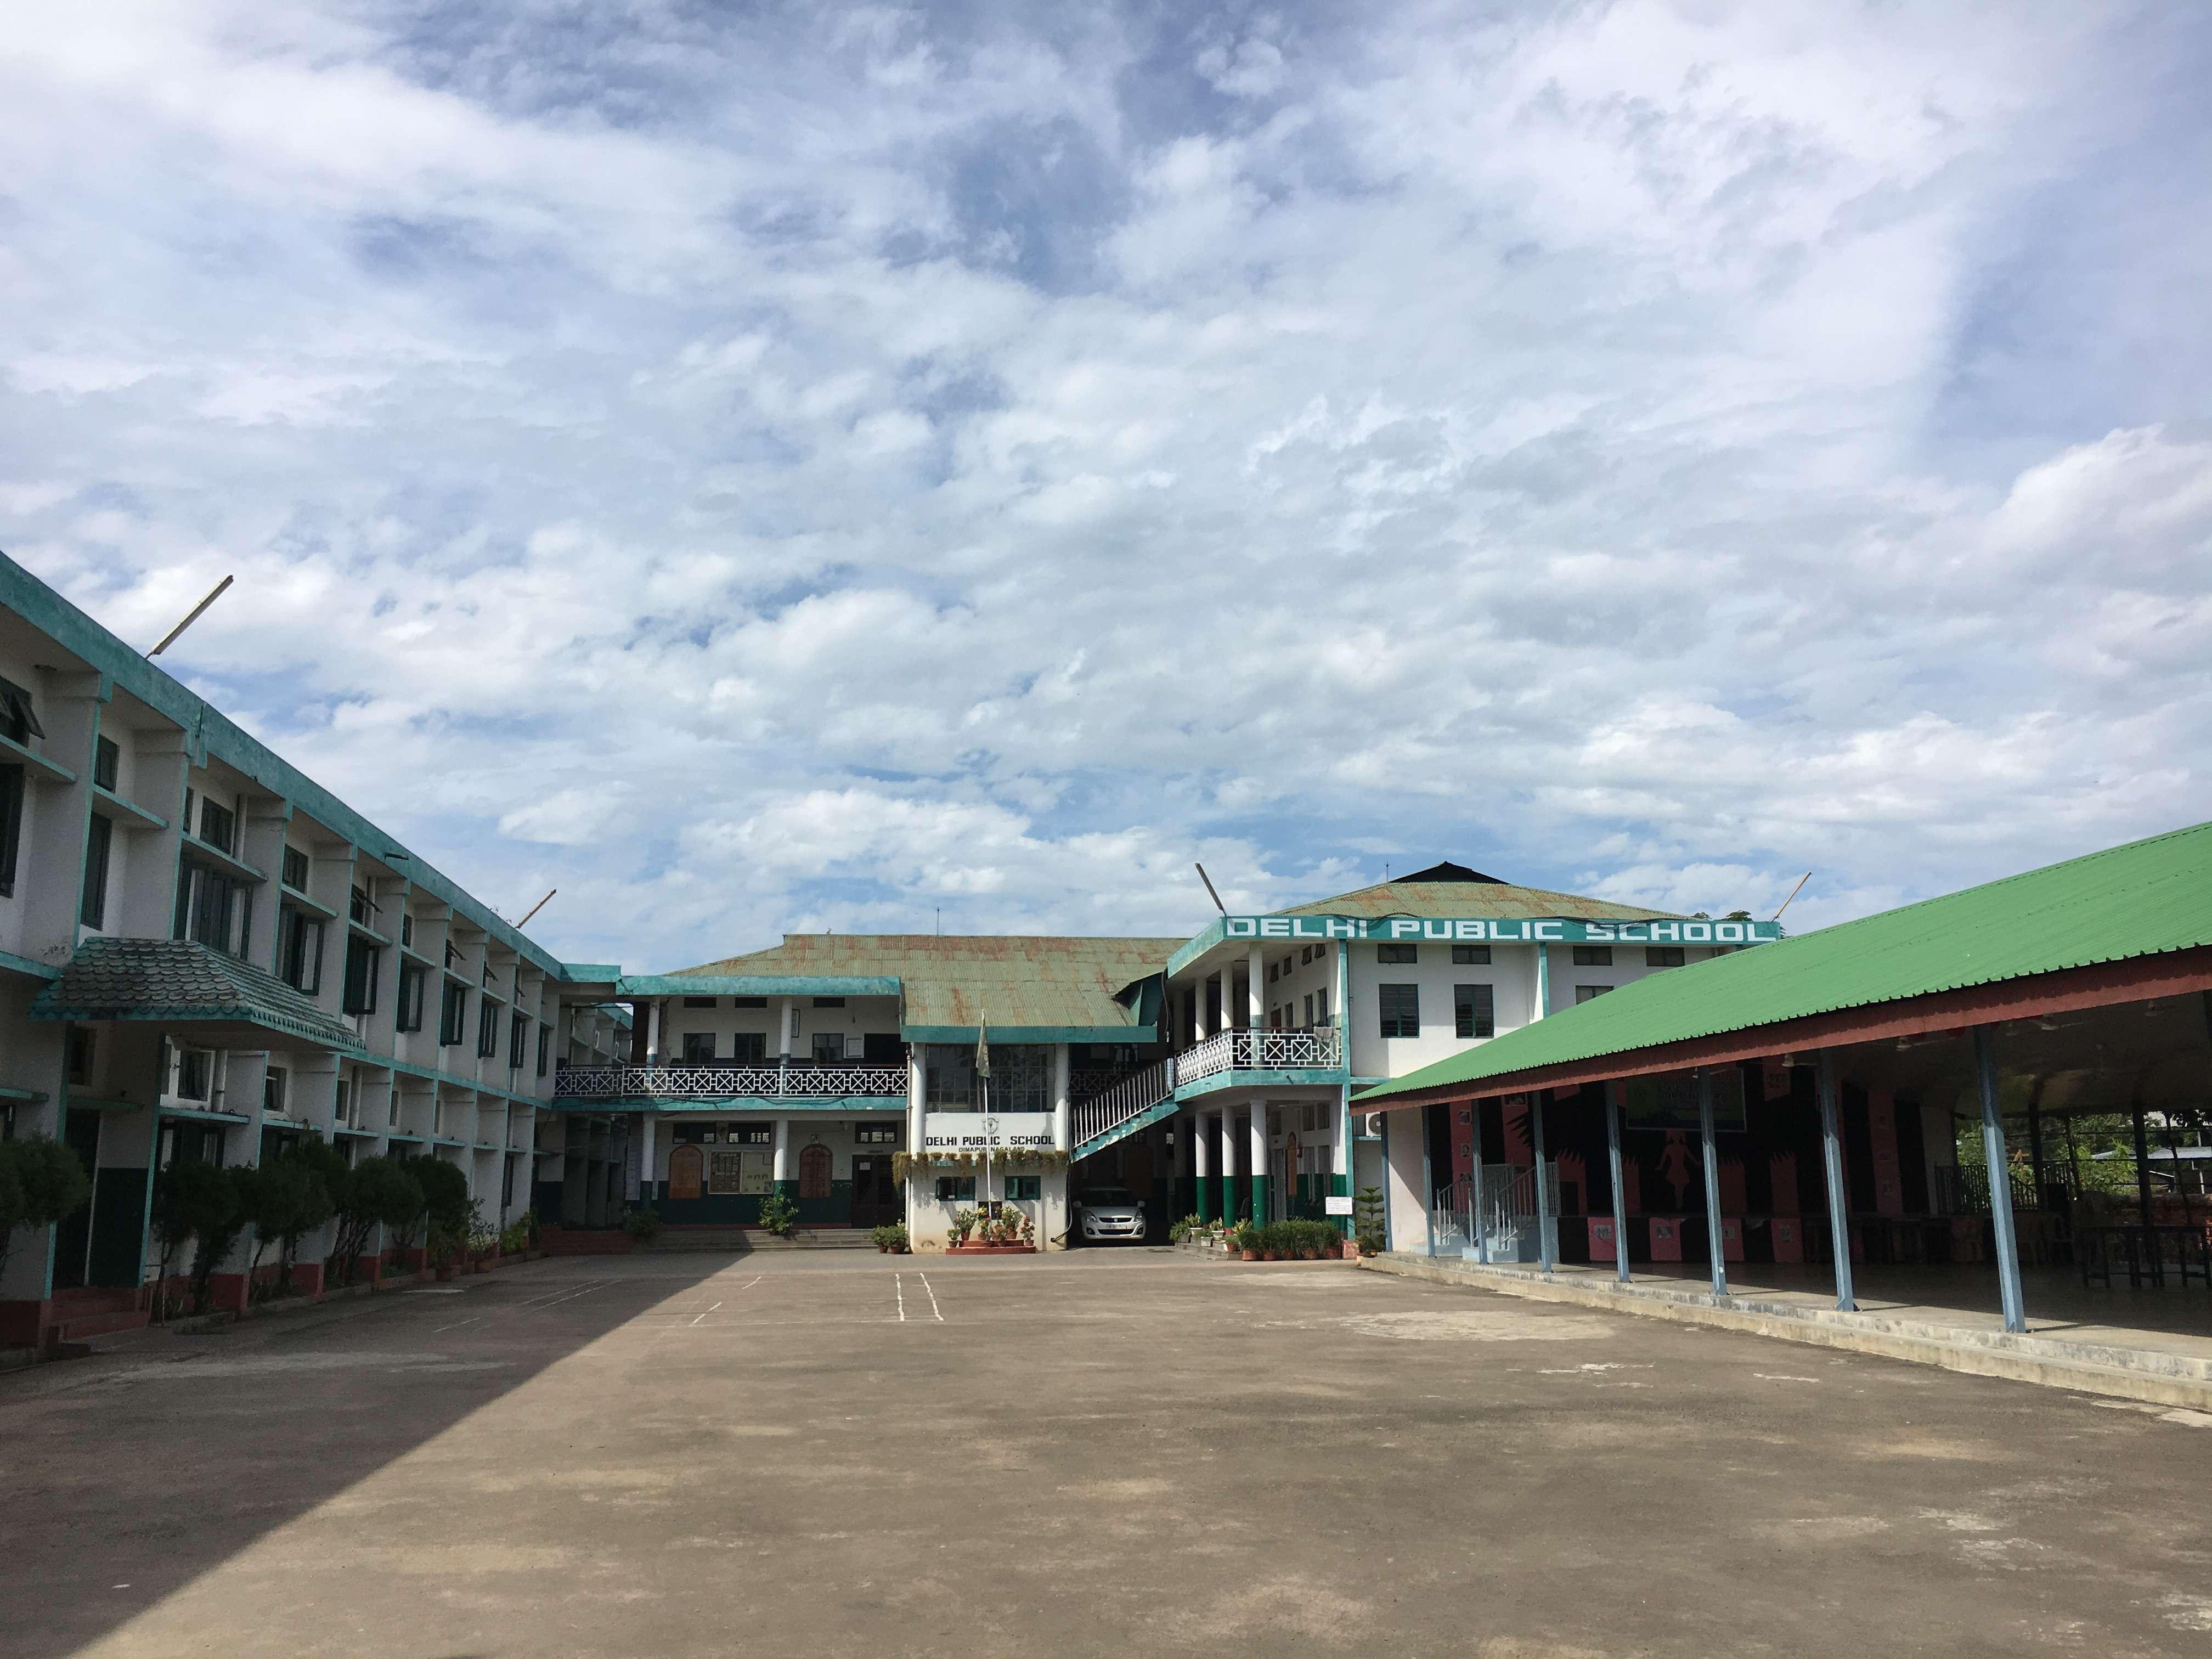 DELHI PUBLIC SCHOOL 2 1 2 MILE DAROGAPATHAR DIMAPUR NAGALAND 1430008